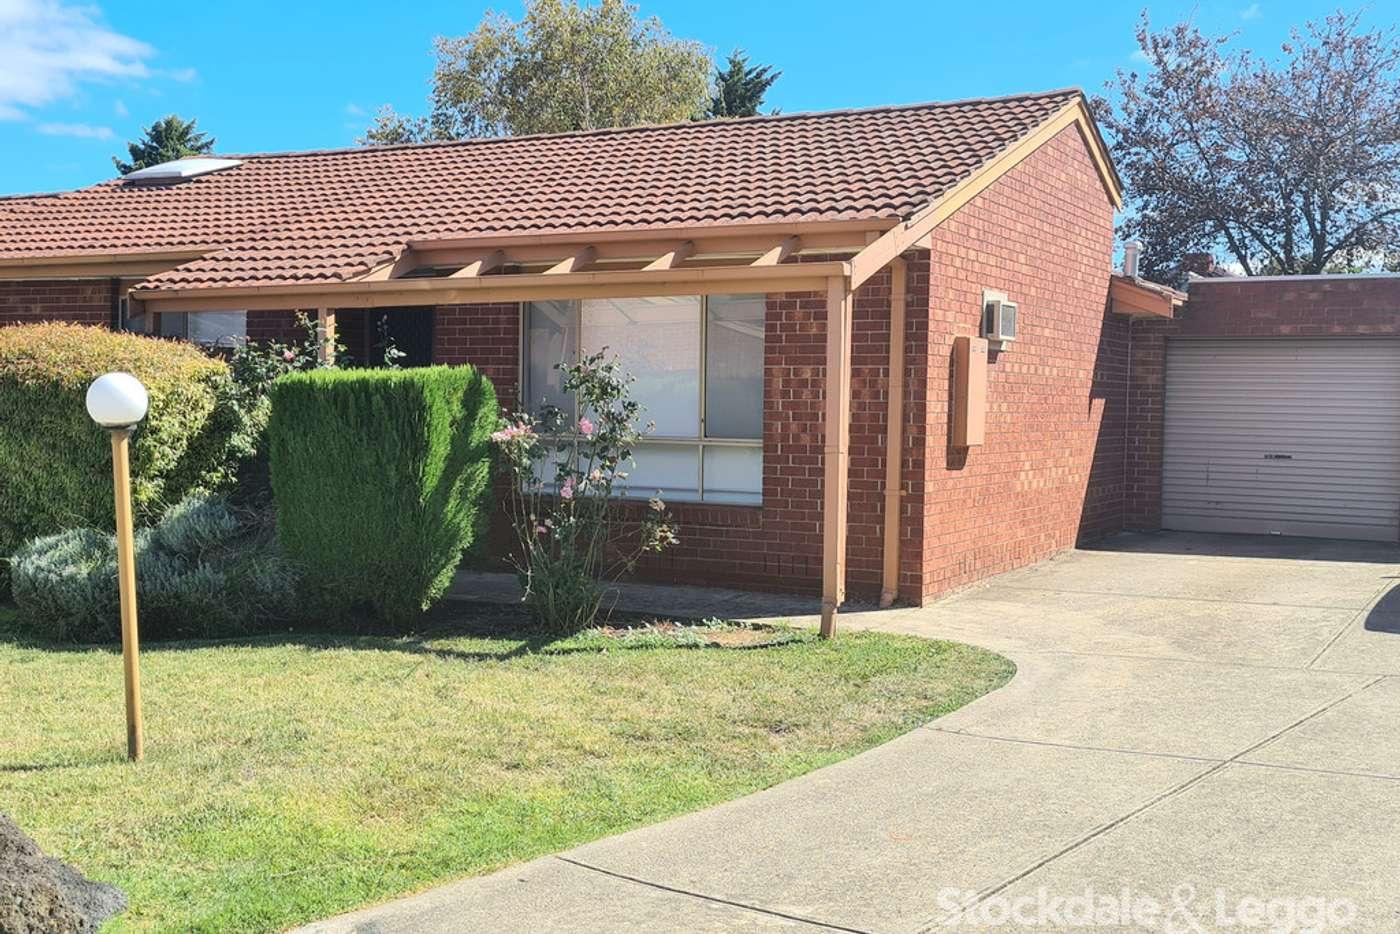 Main view of Homely unit listing, 16/117 Plenty Road, Bundoora VIC 3083